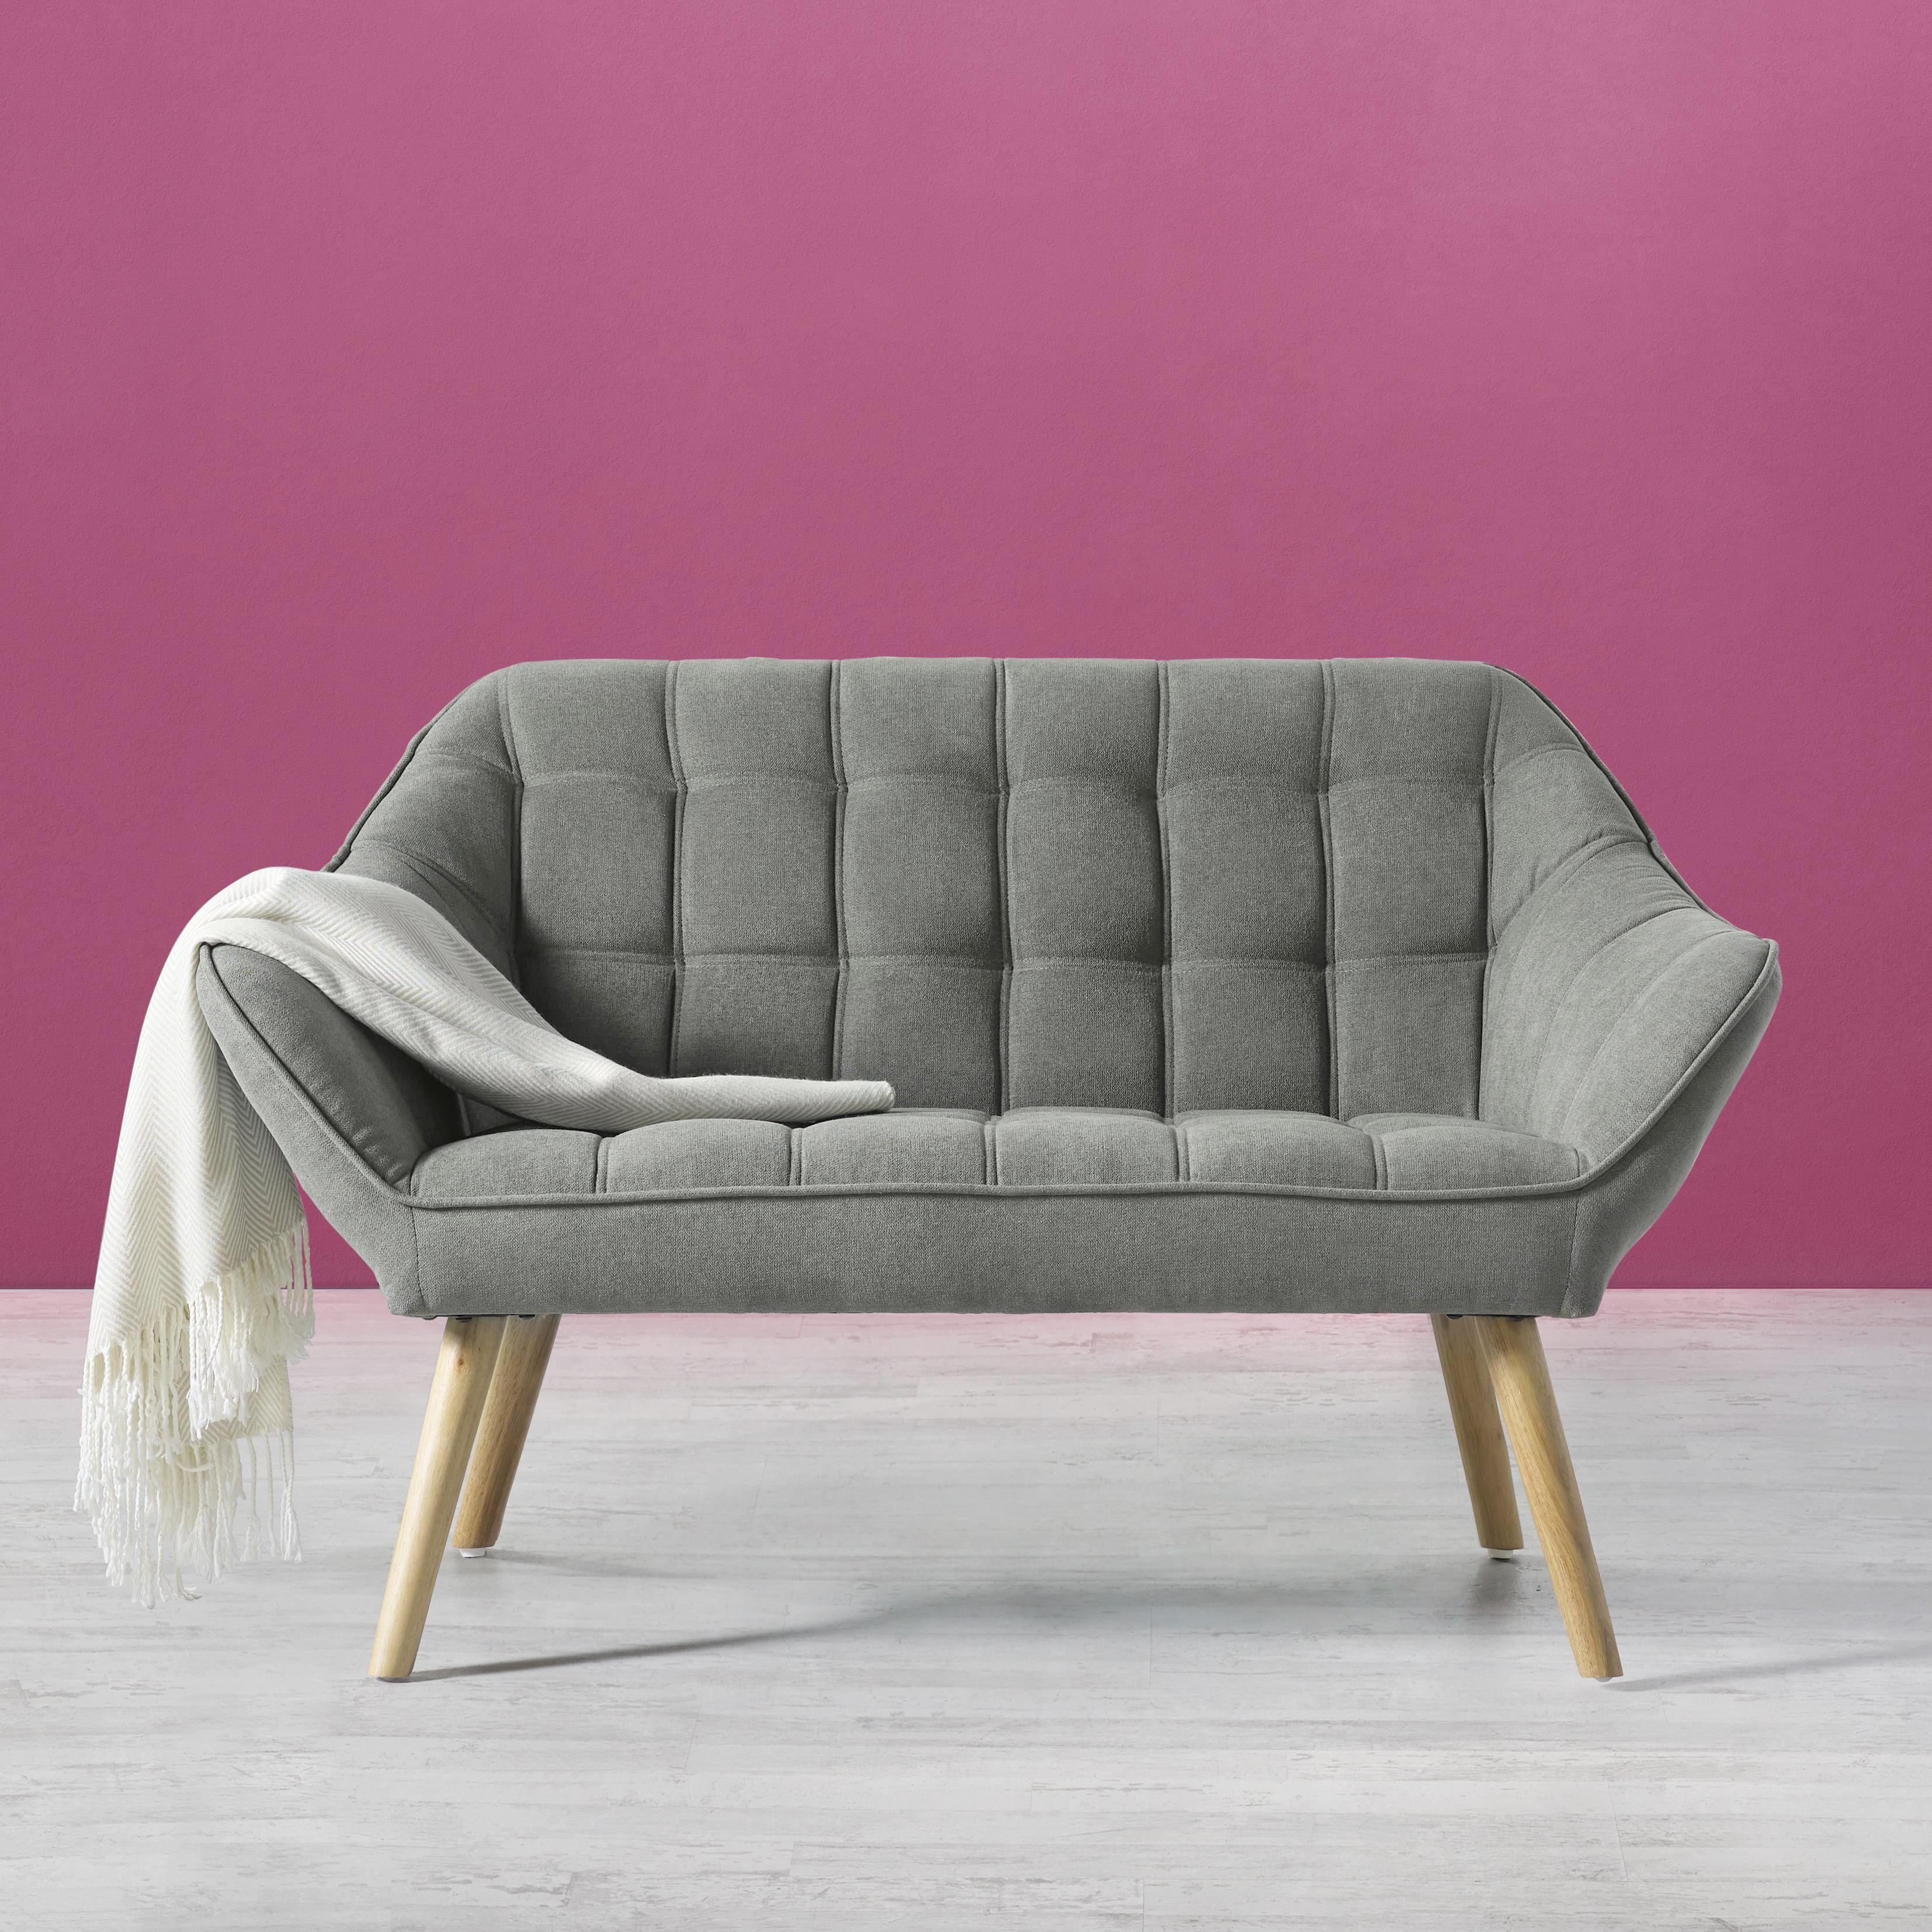 Sofa In Grau Monique In 2020 Zweisitzer Sofa Couch Grun